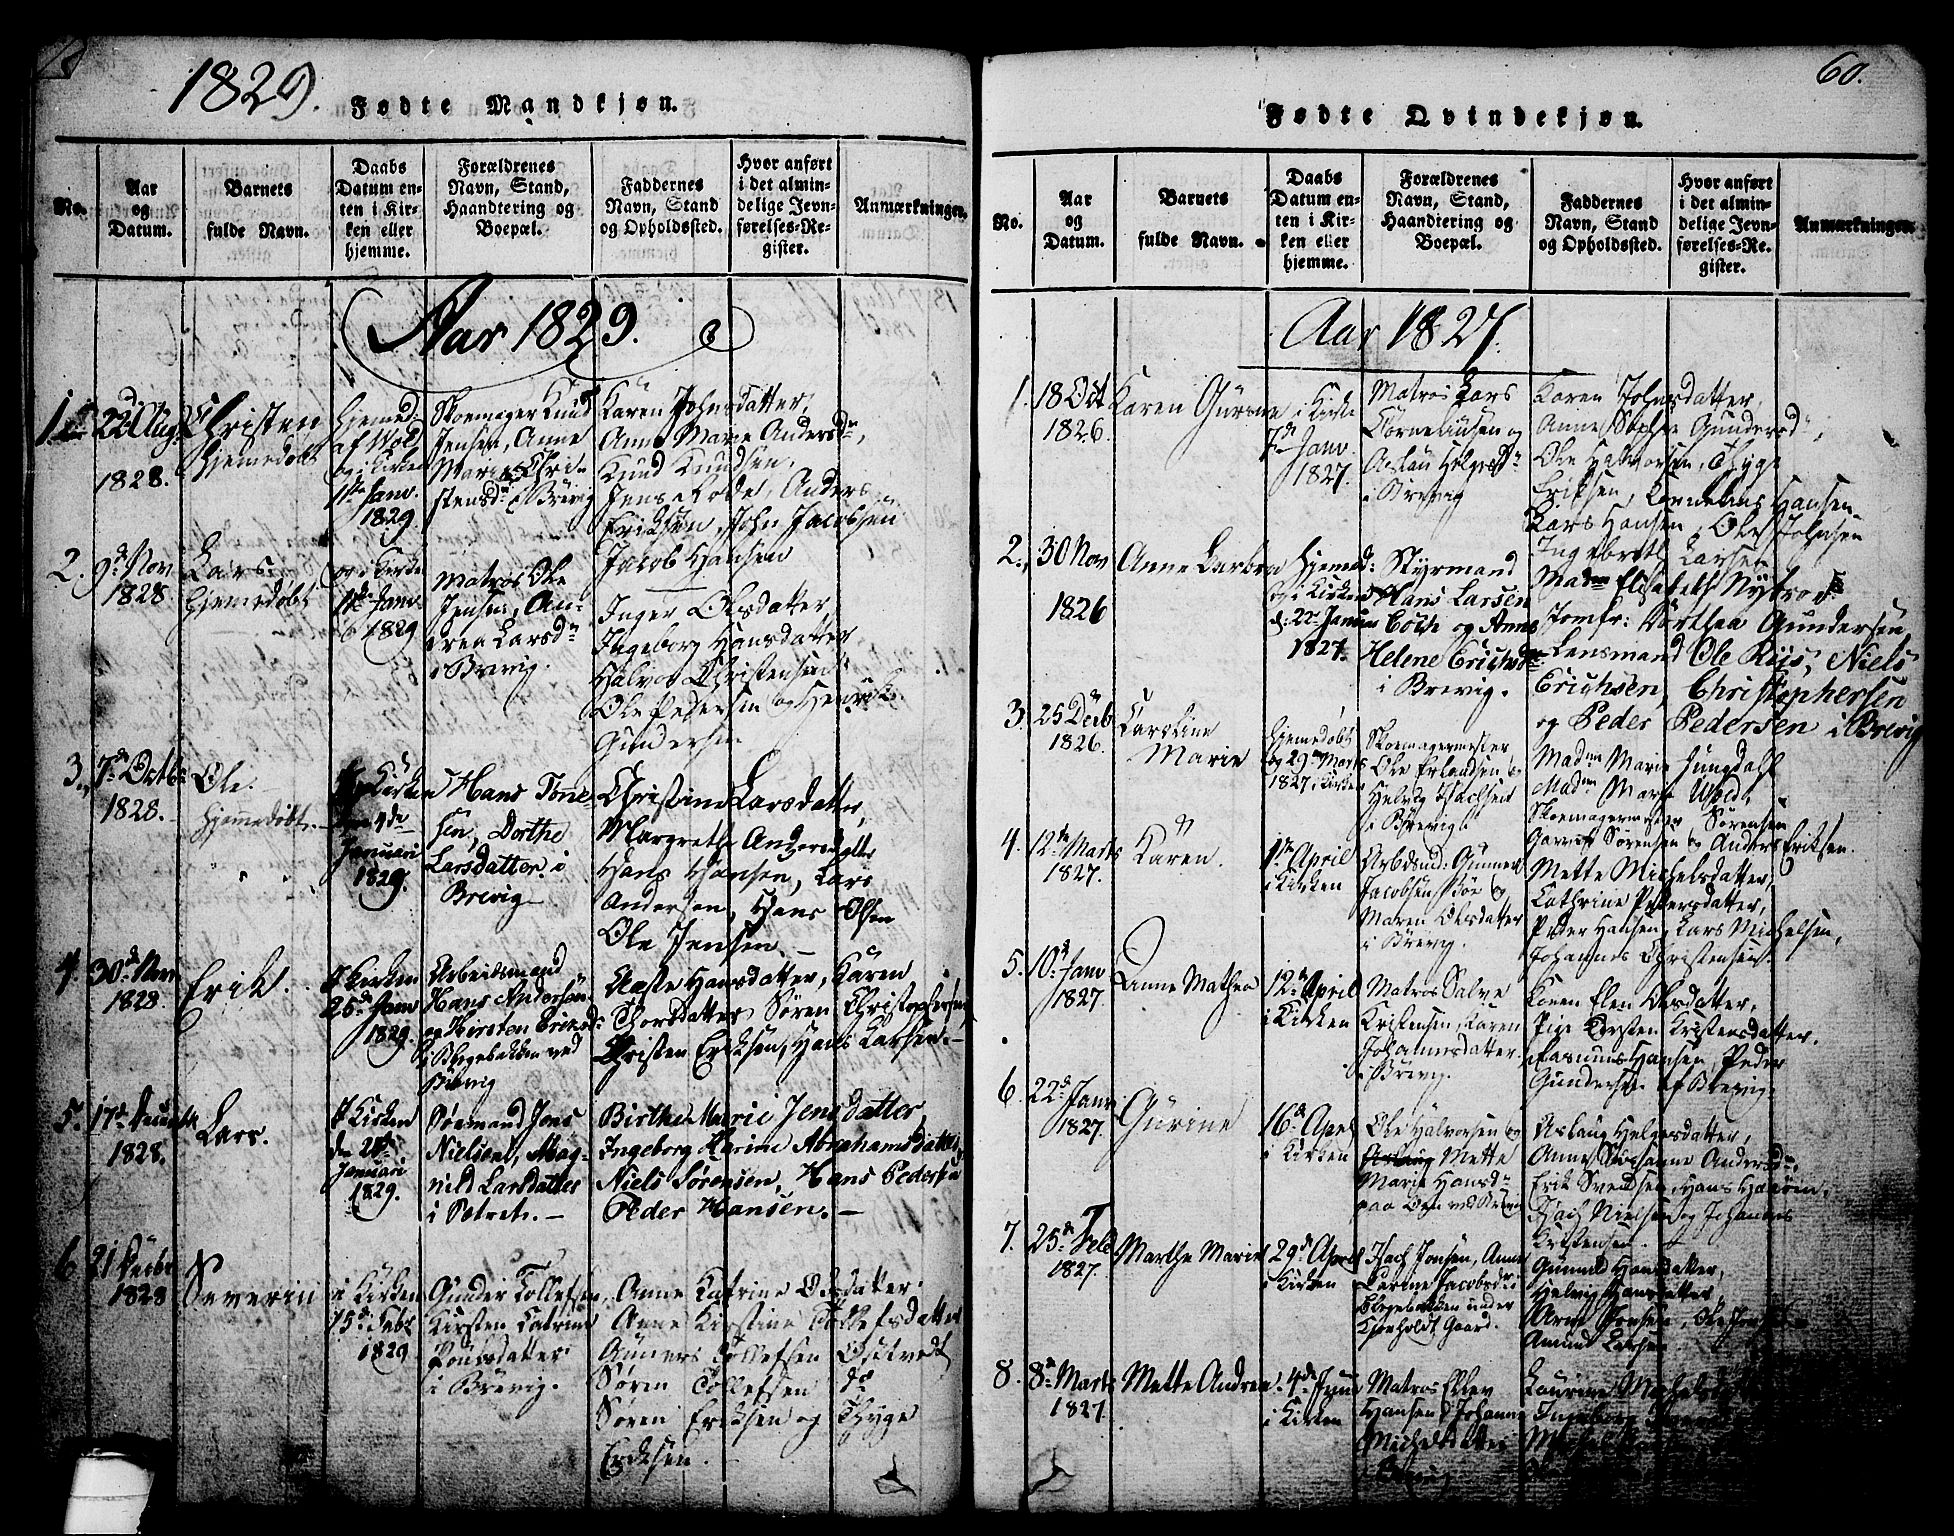 SAKO, Brevik kirkebøker, G/Ga/L0001: Klokkerbok nr. 1, 1814-1845, s. 60